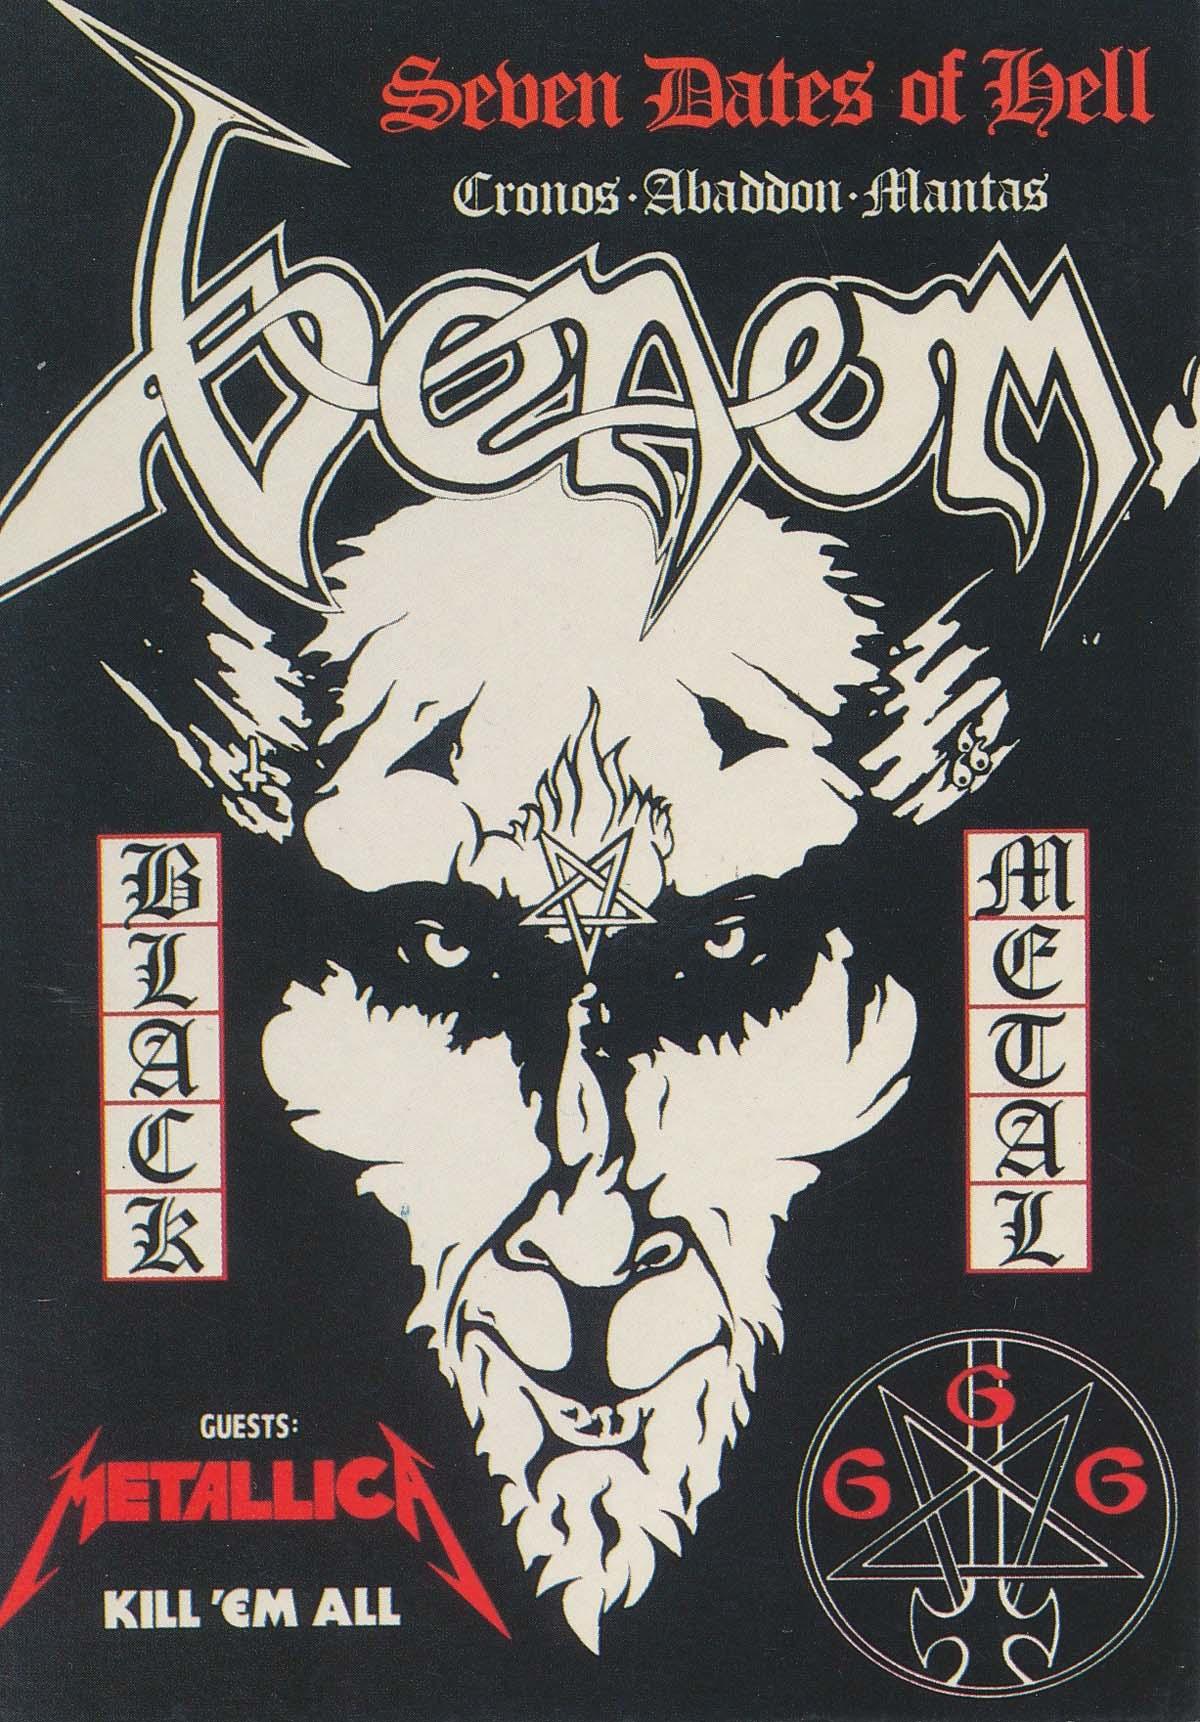 a heavy metal postcard with a devil like figure on it